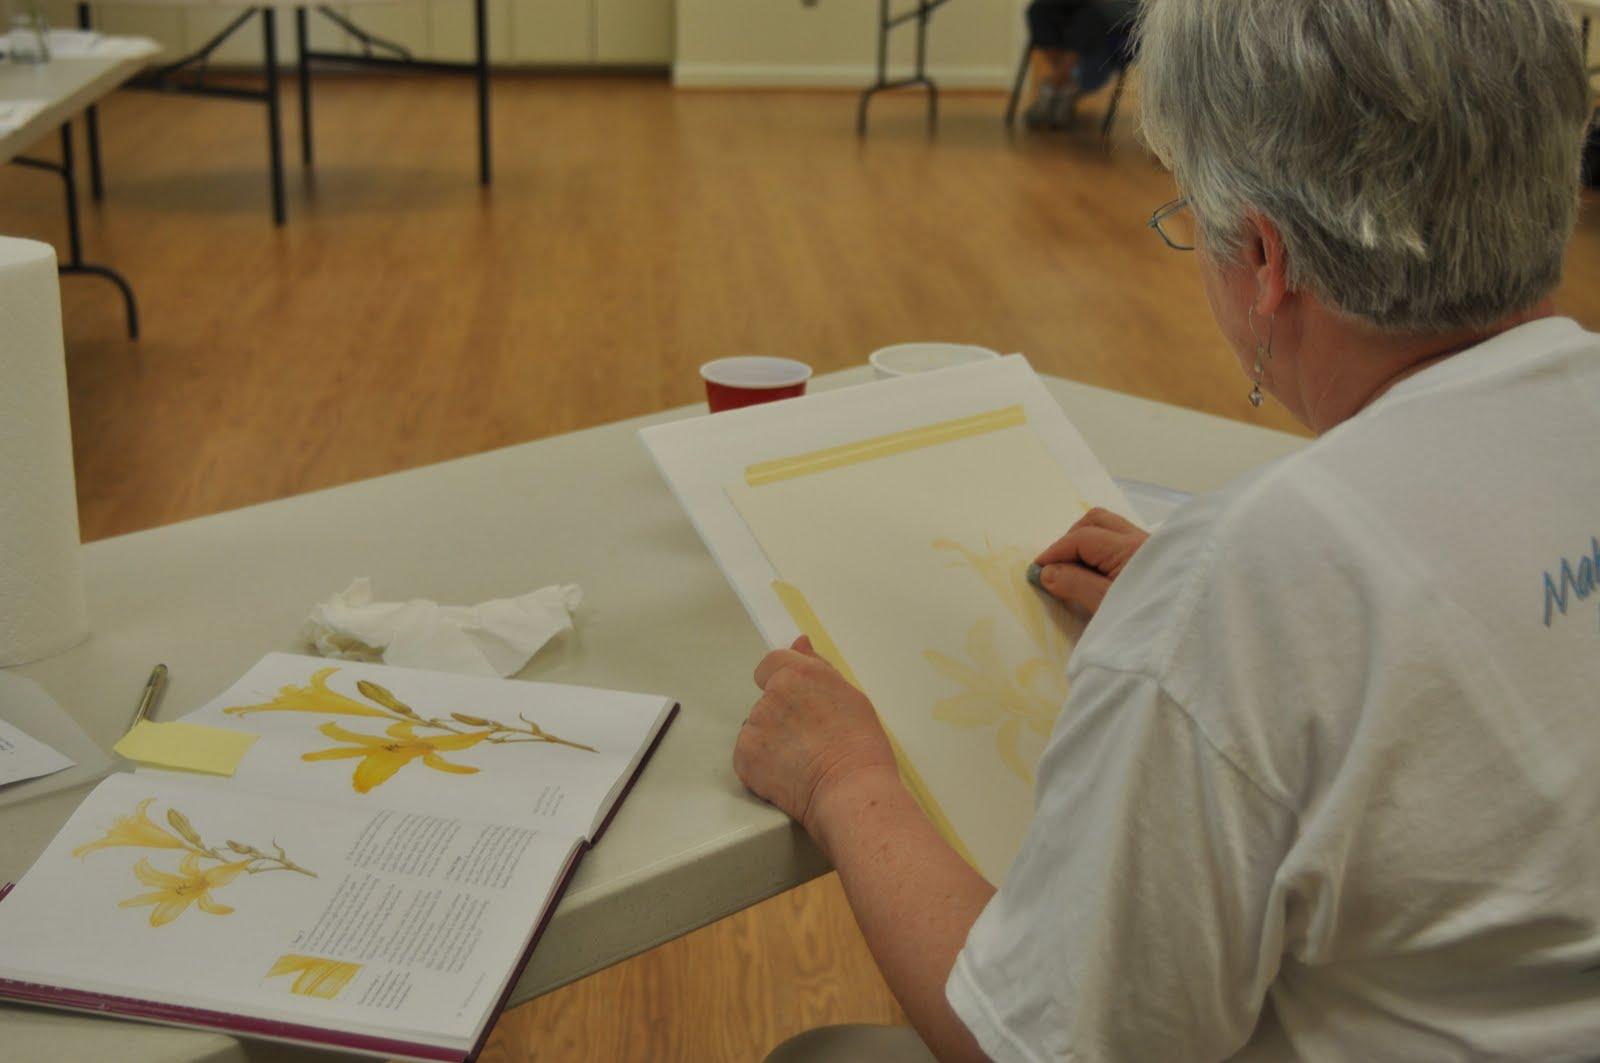 CA%2BDay%2BTwo%2B Art Instruction with Linda C. Miller: Visiting Artist Workshops: Watercolor ...